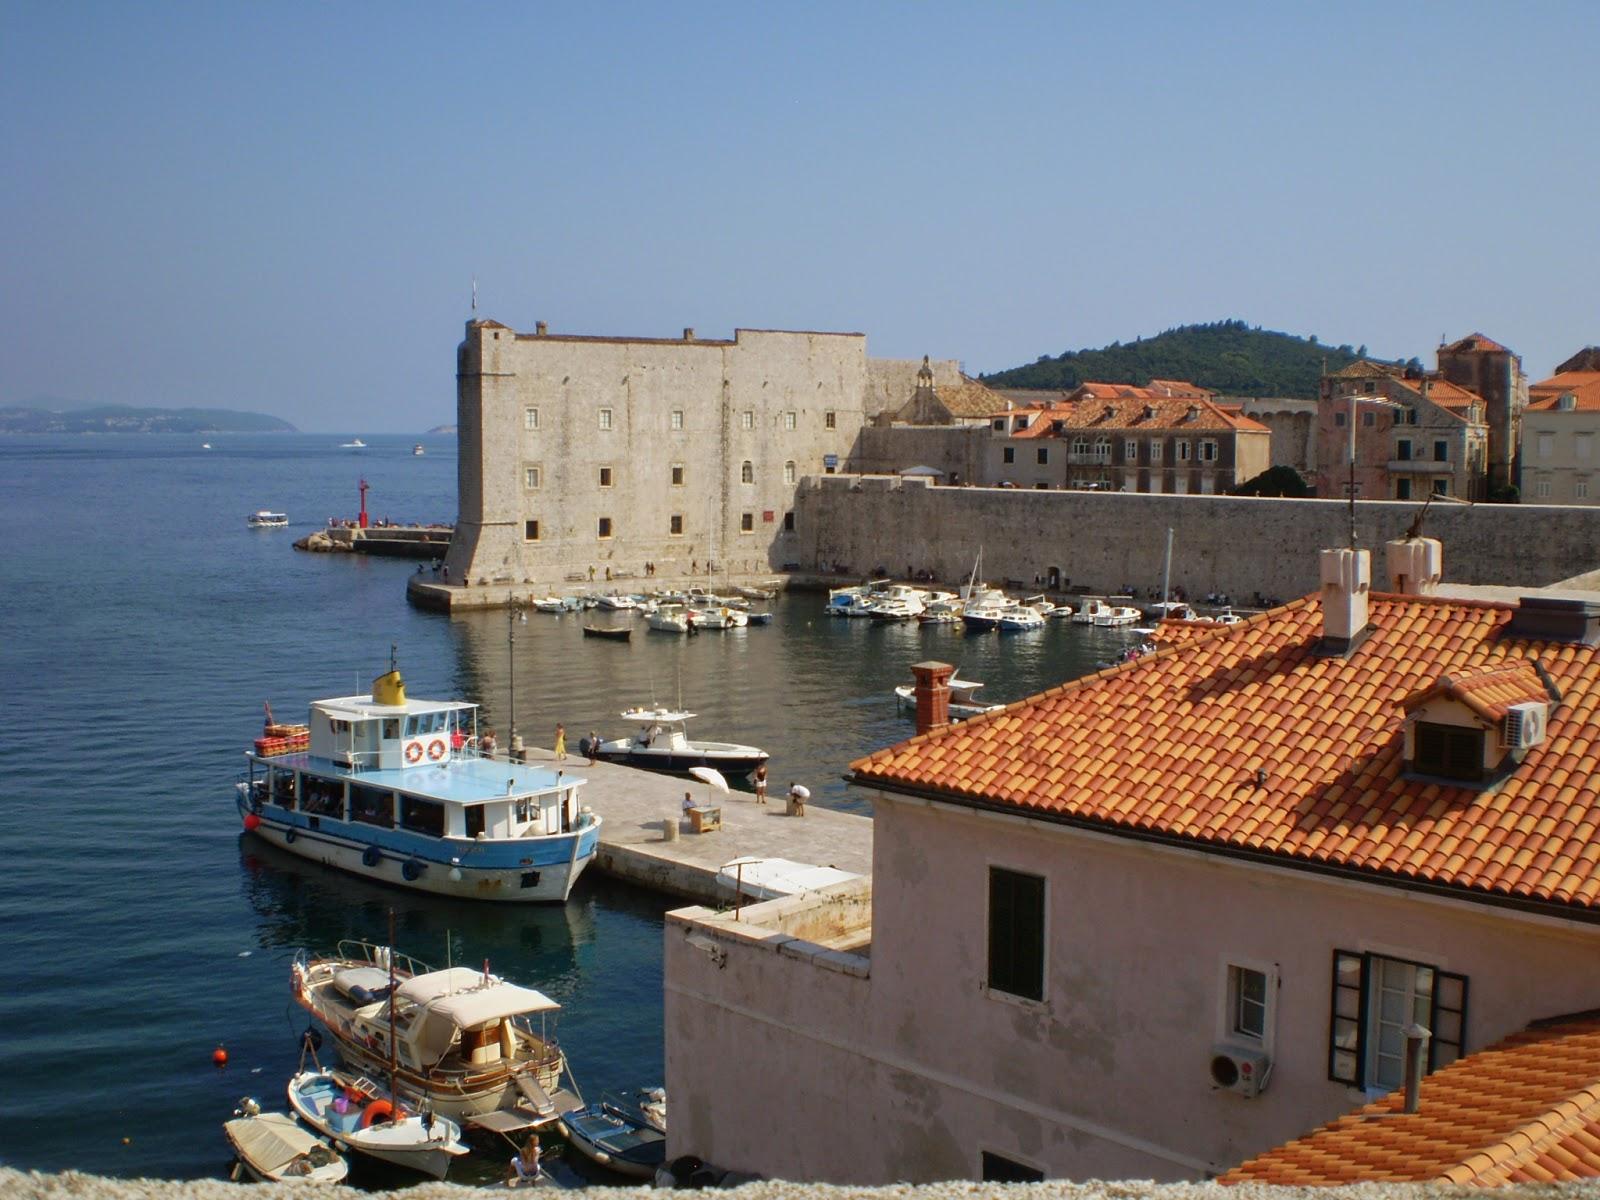 Gavan-Dubrovnik